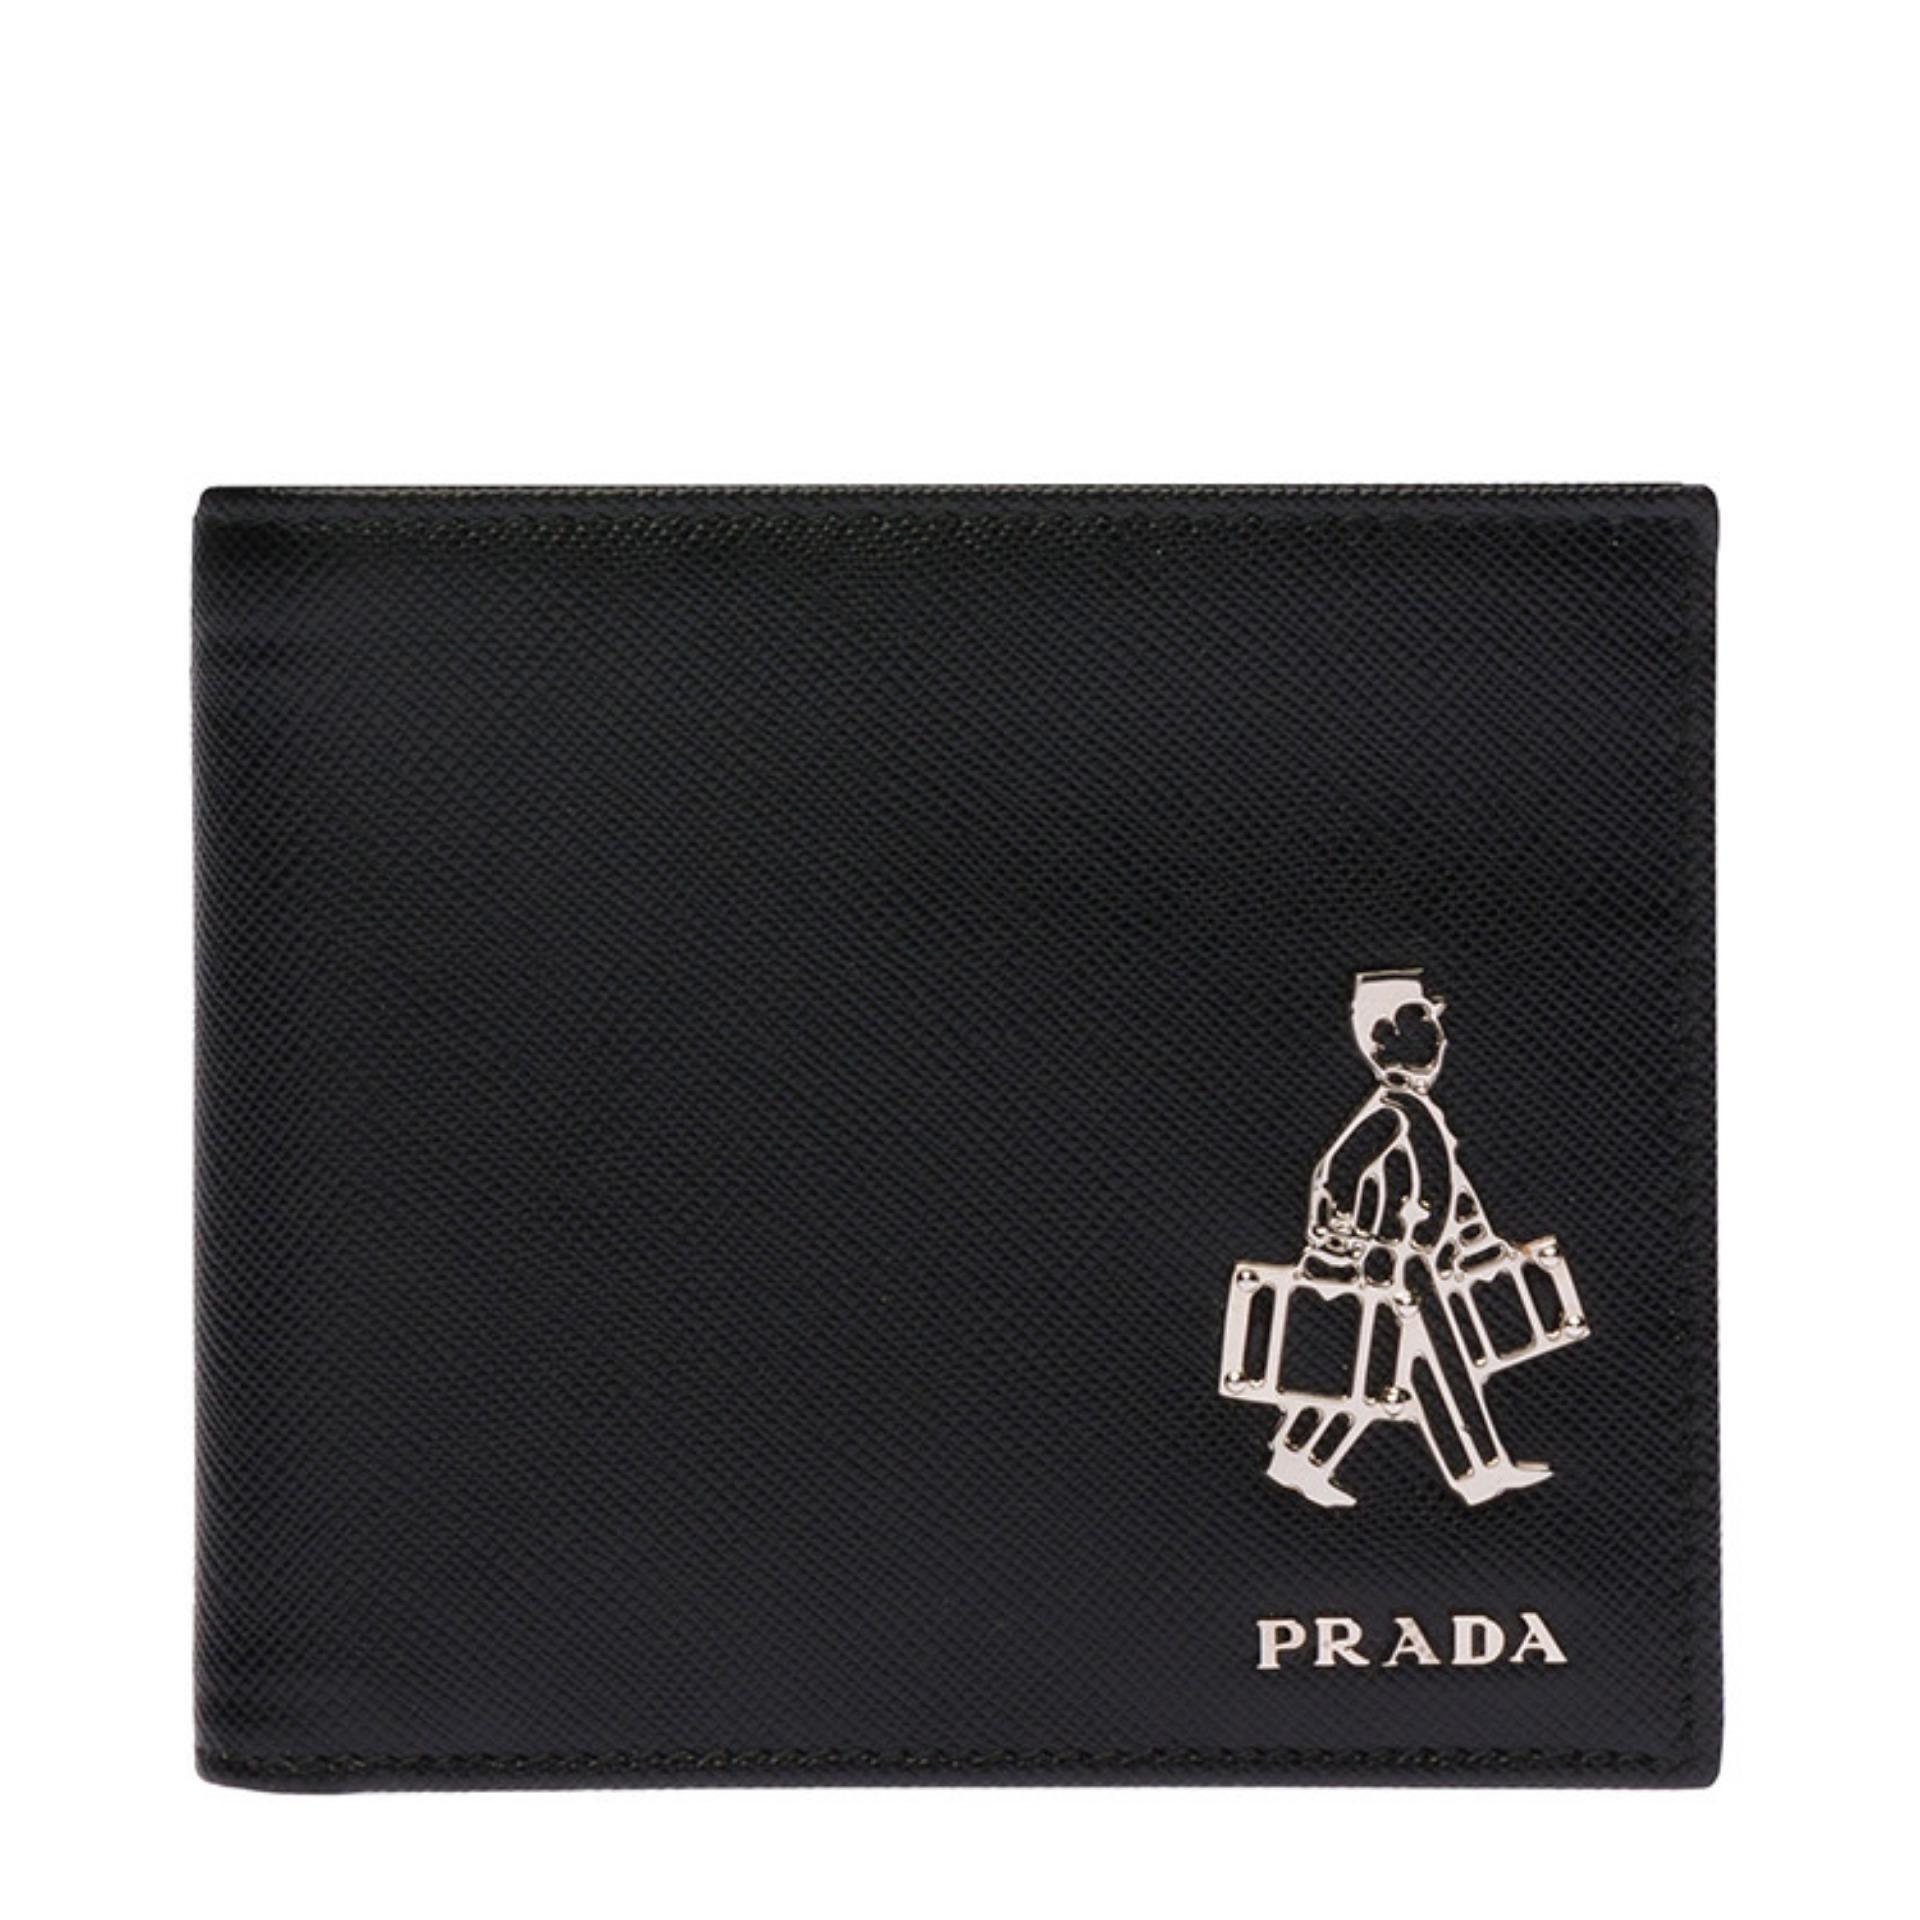 0a2141e96bfa ... where to buy singapore. prada saffiano porter bifold wallet with coin  pouch nero 2mo7389z2f0002 ca51a